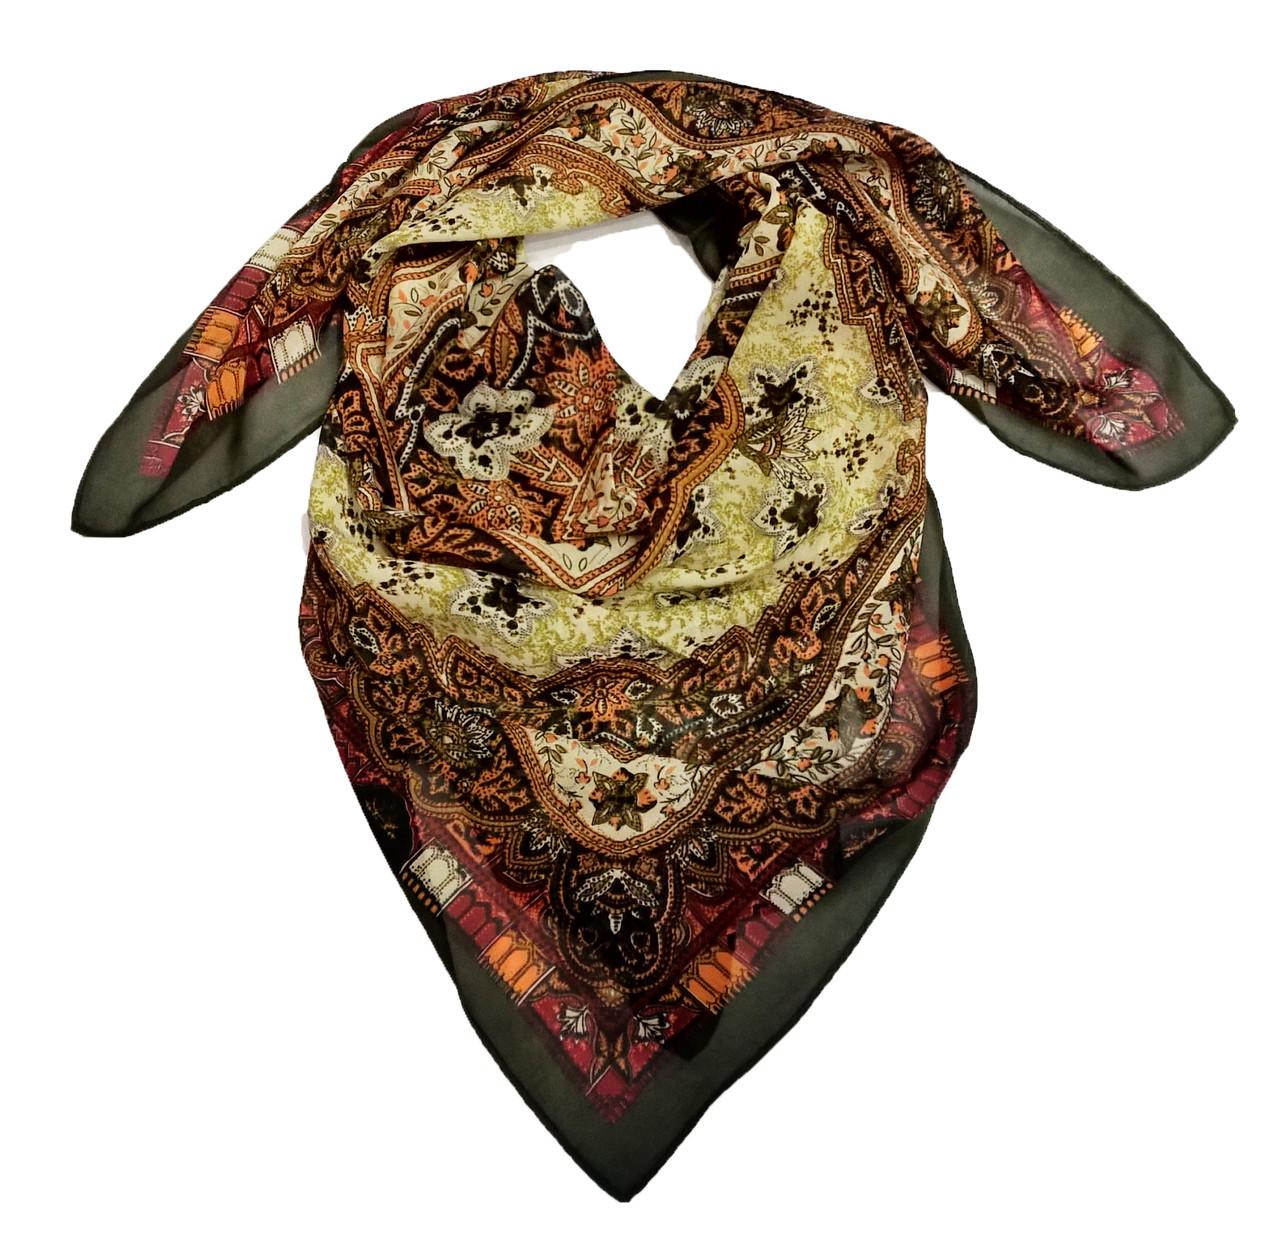 Платок Гулия, 90*90 см, опт 52 грн.